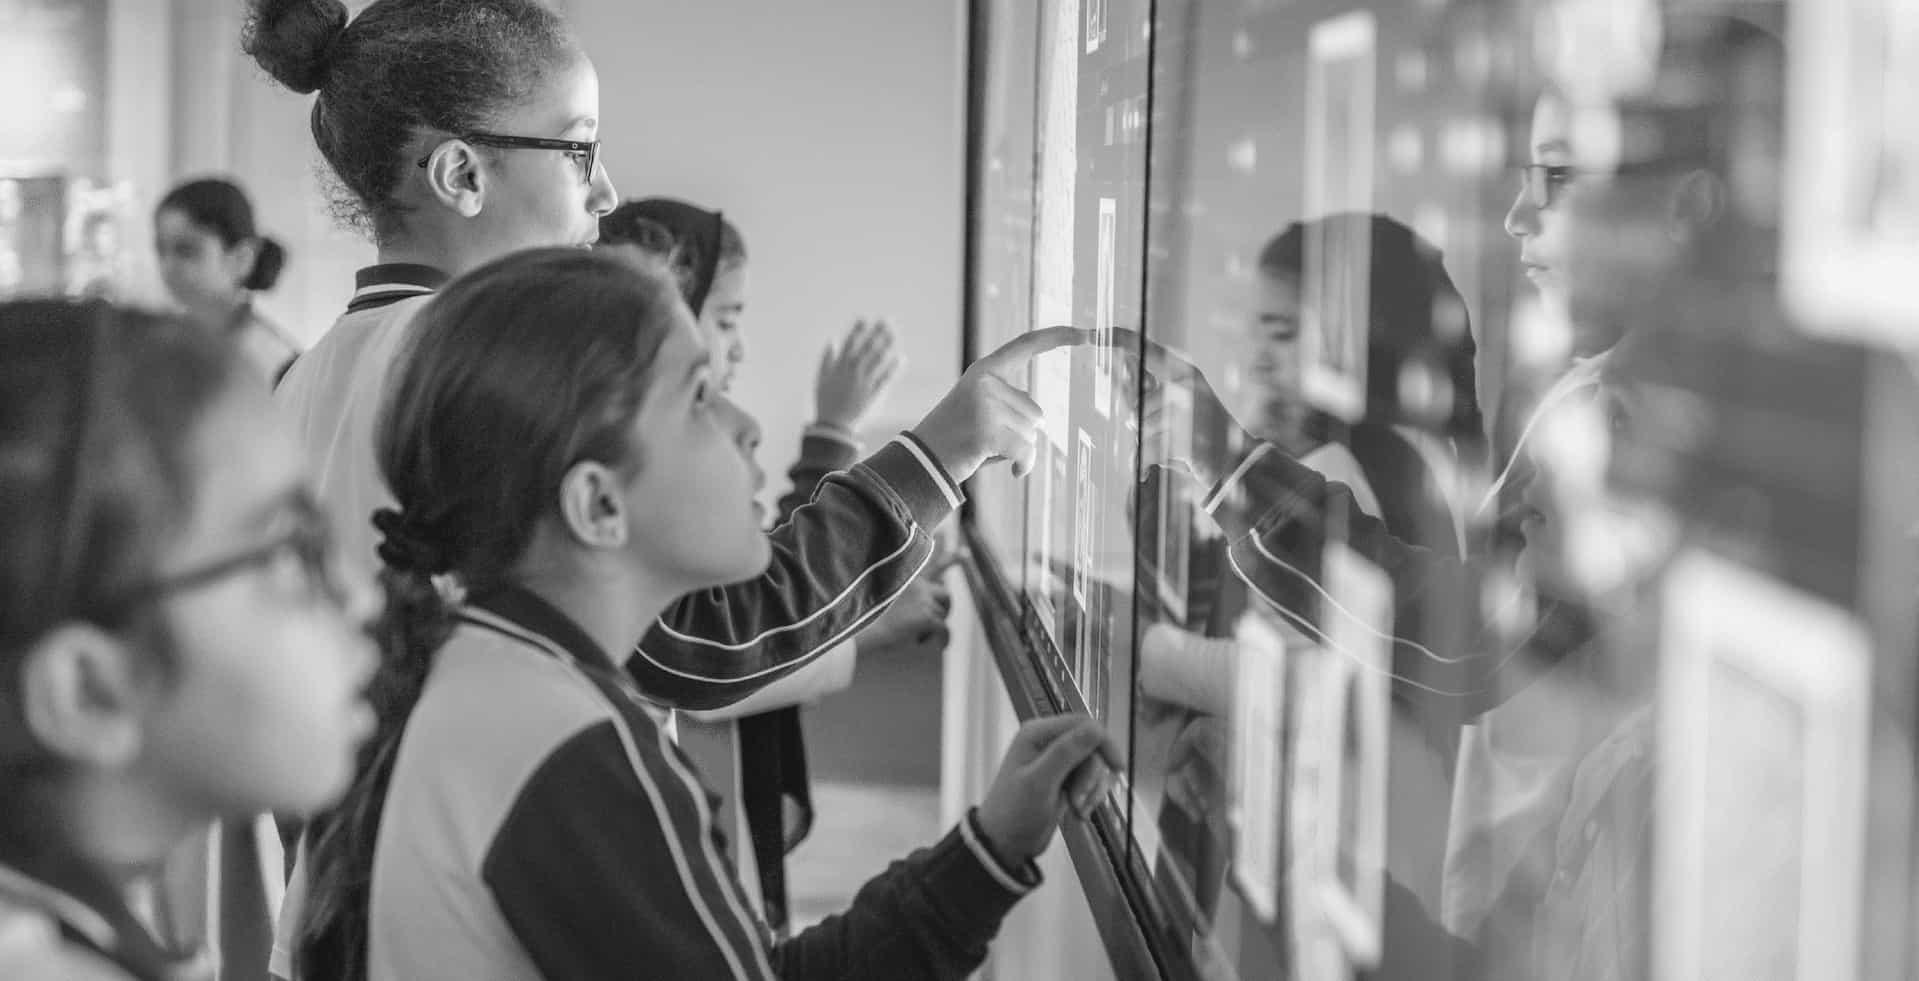 Education Must Encourage Creativity Instead of Stifling It